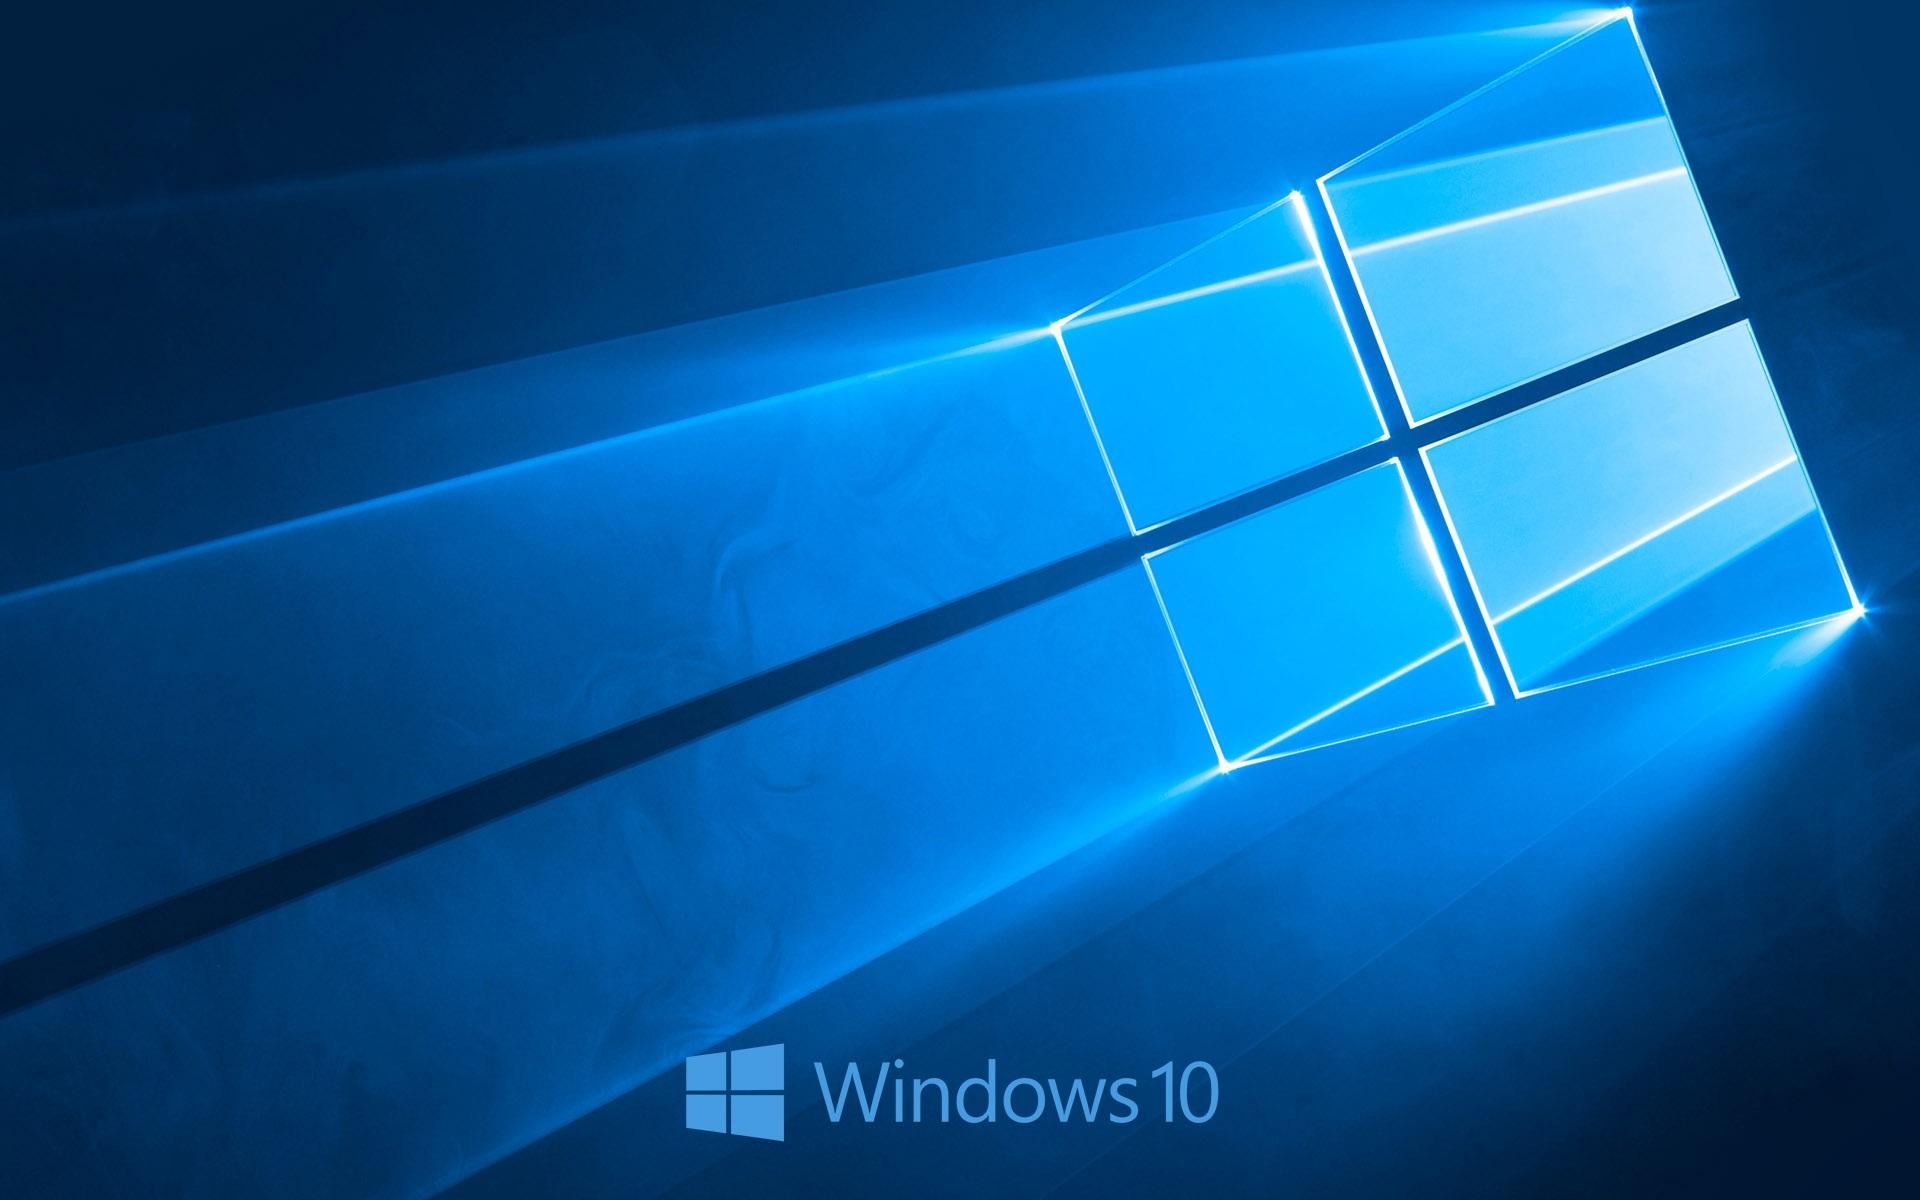 Logotipo de Windows 10 del sistema, estilo azul de fondo